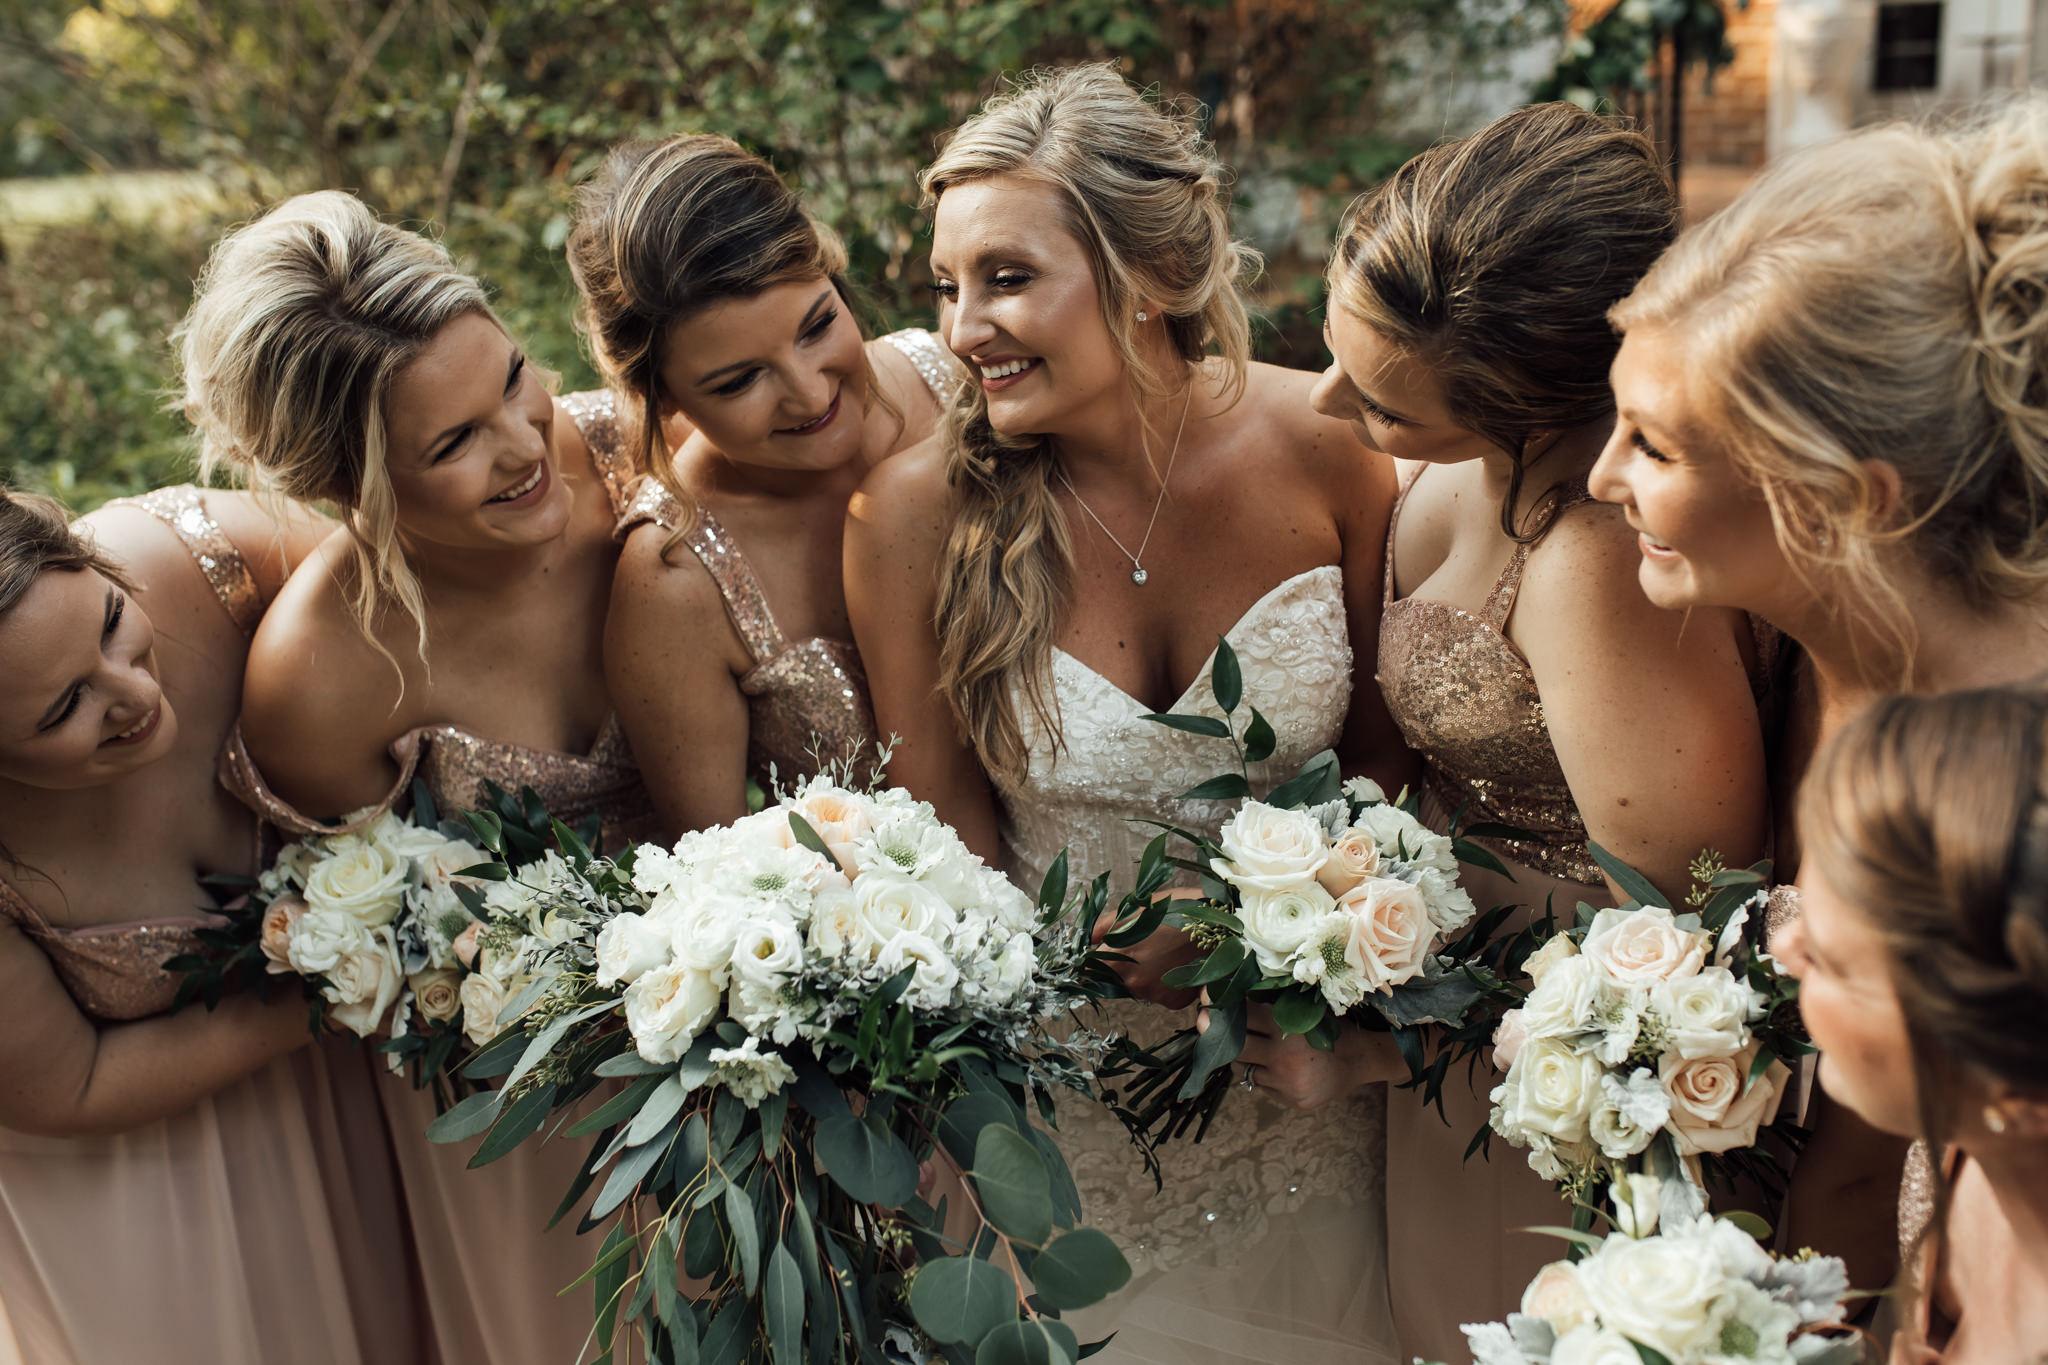 davis-home-strawberry-plains-wedding-cassie-cook-photography-memphis-wedding-photographer-66.jpg